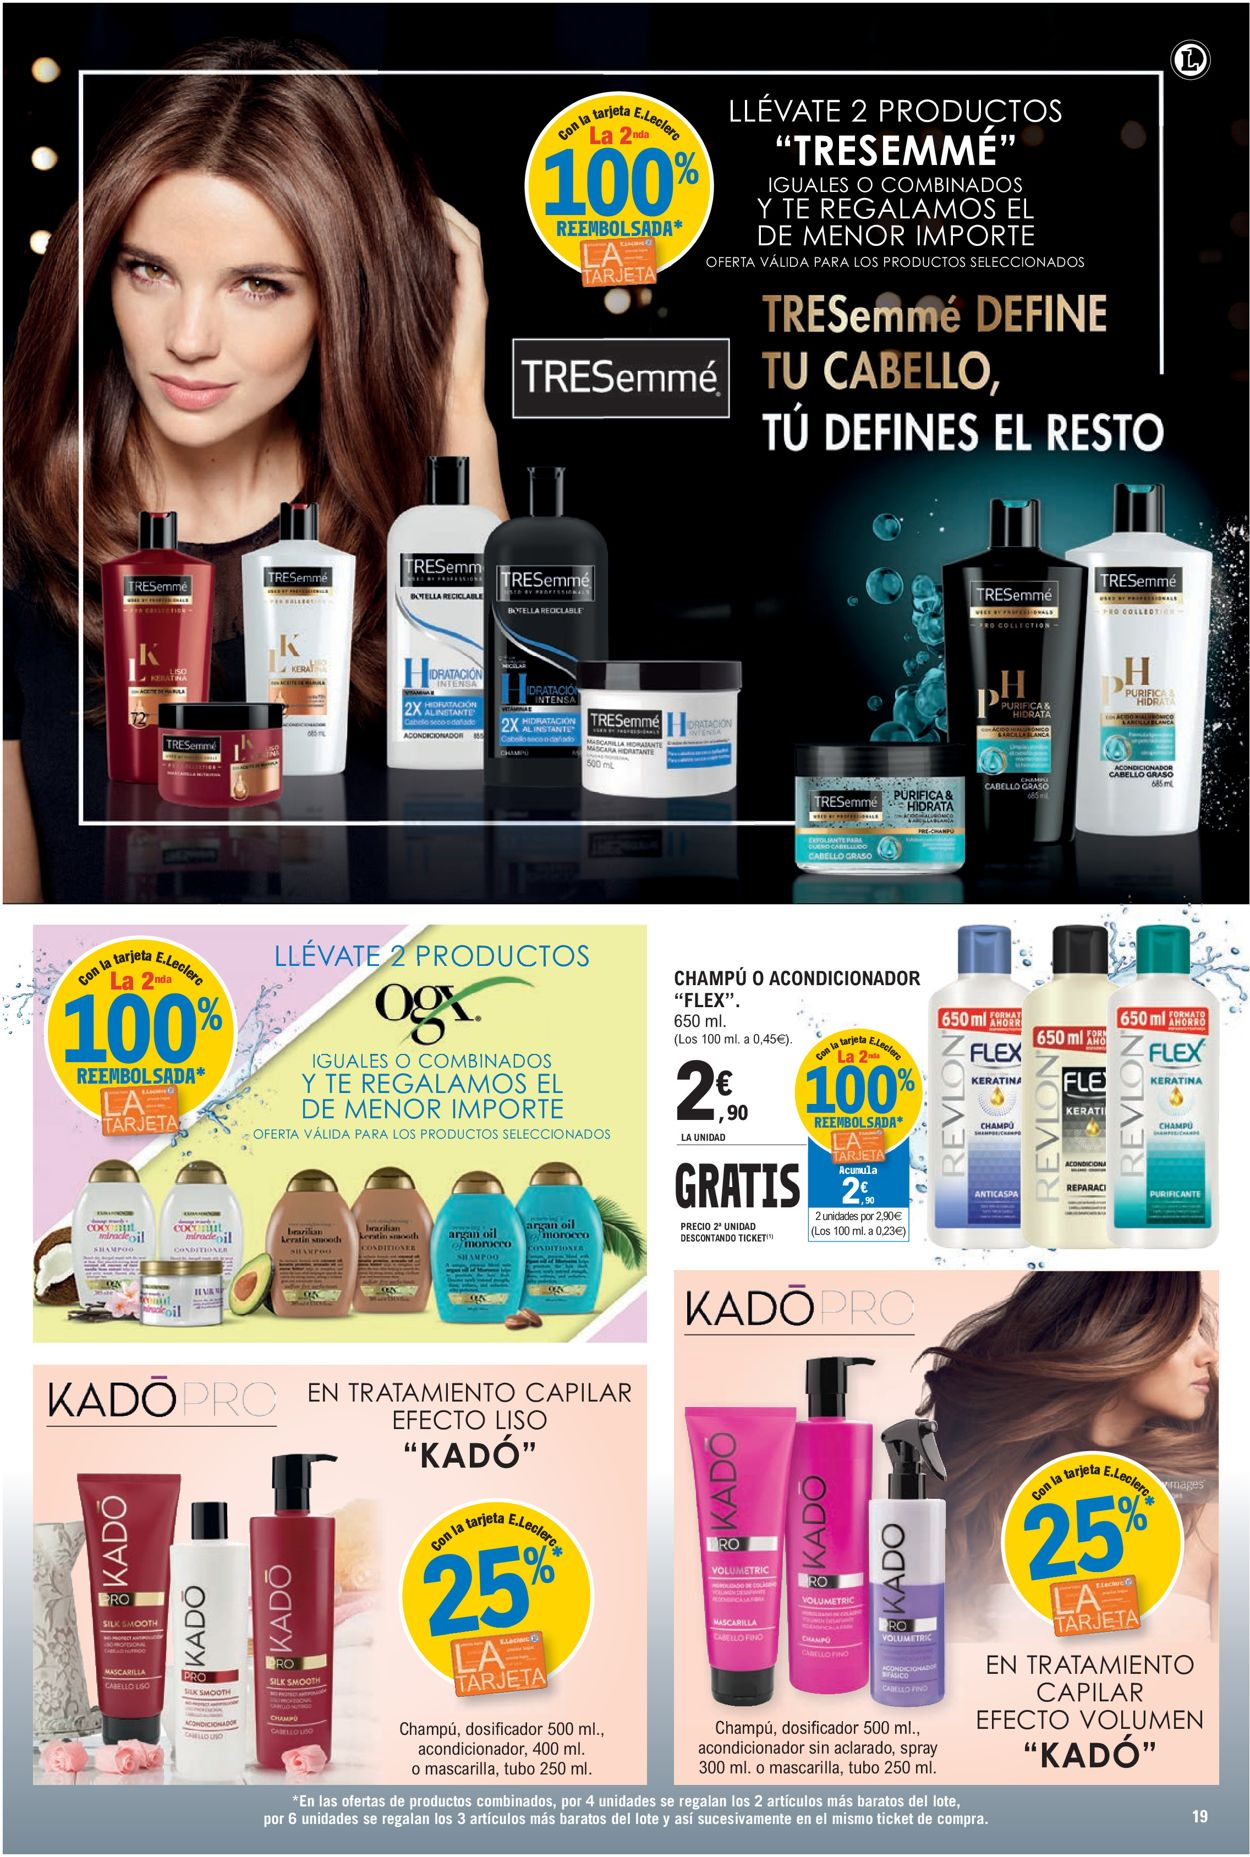 E.leclerc Folleto - 26.05-06.06.2021 (Página 19)